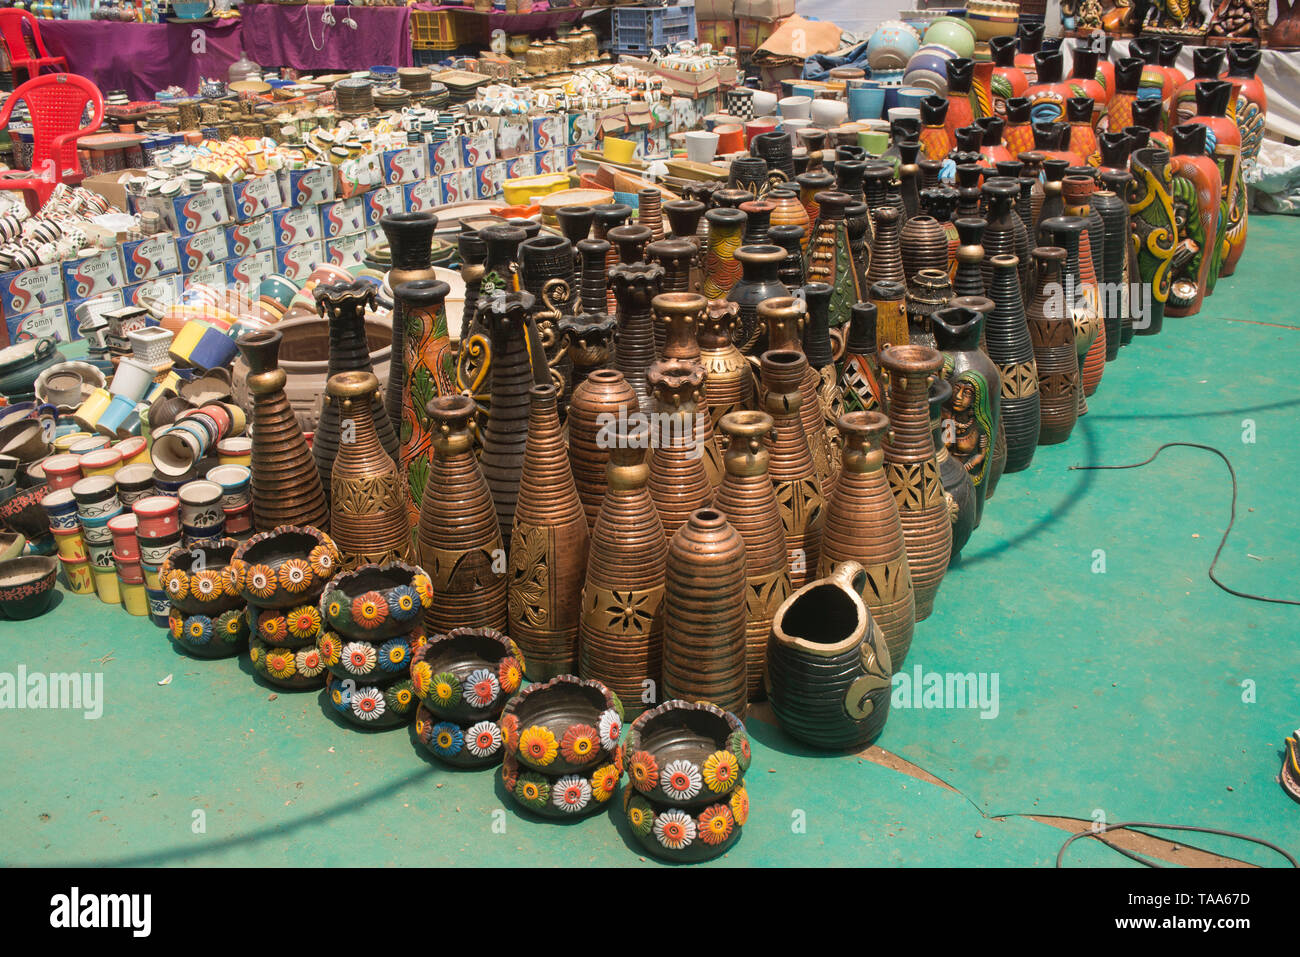 Surai kept for sell, Thane, Maharashtra, India, Asia - Stock Image